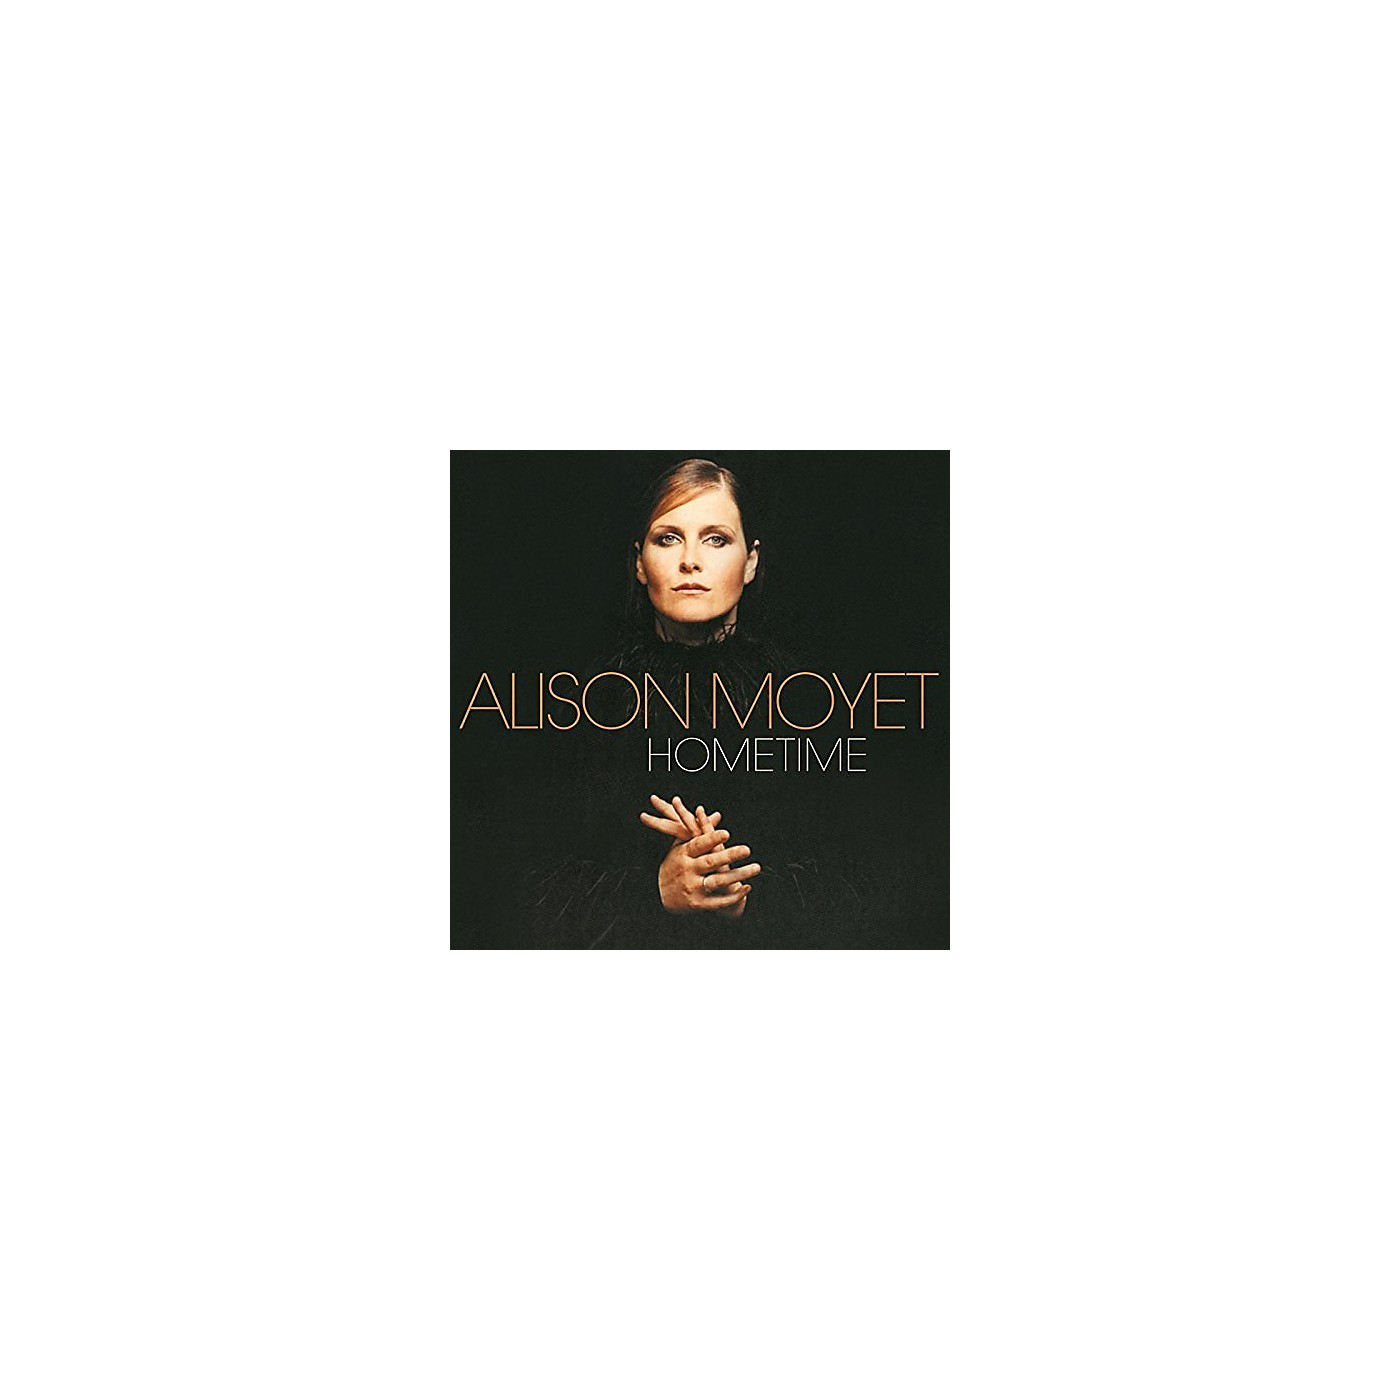 Alliance Alison Moyet - Hometime: Deluxe Edition thumbnail